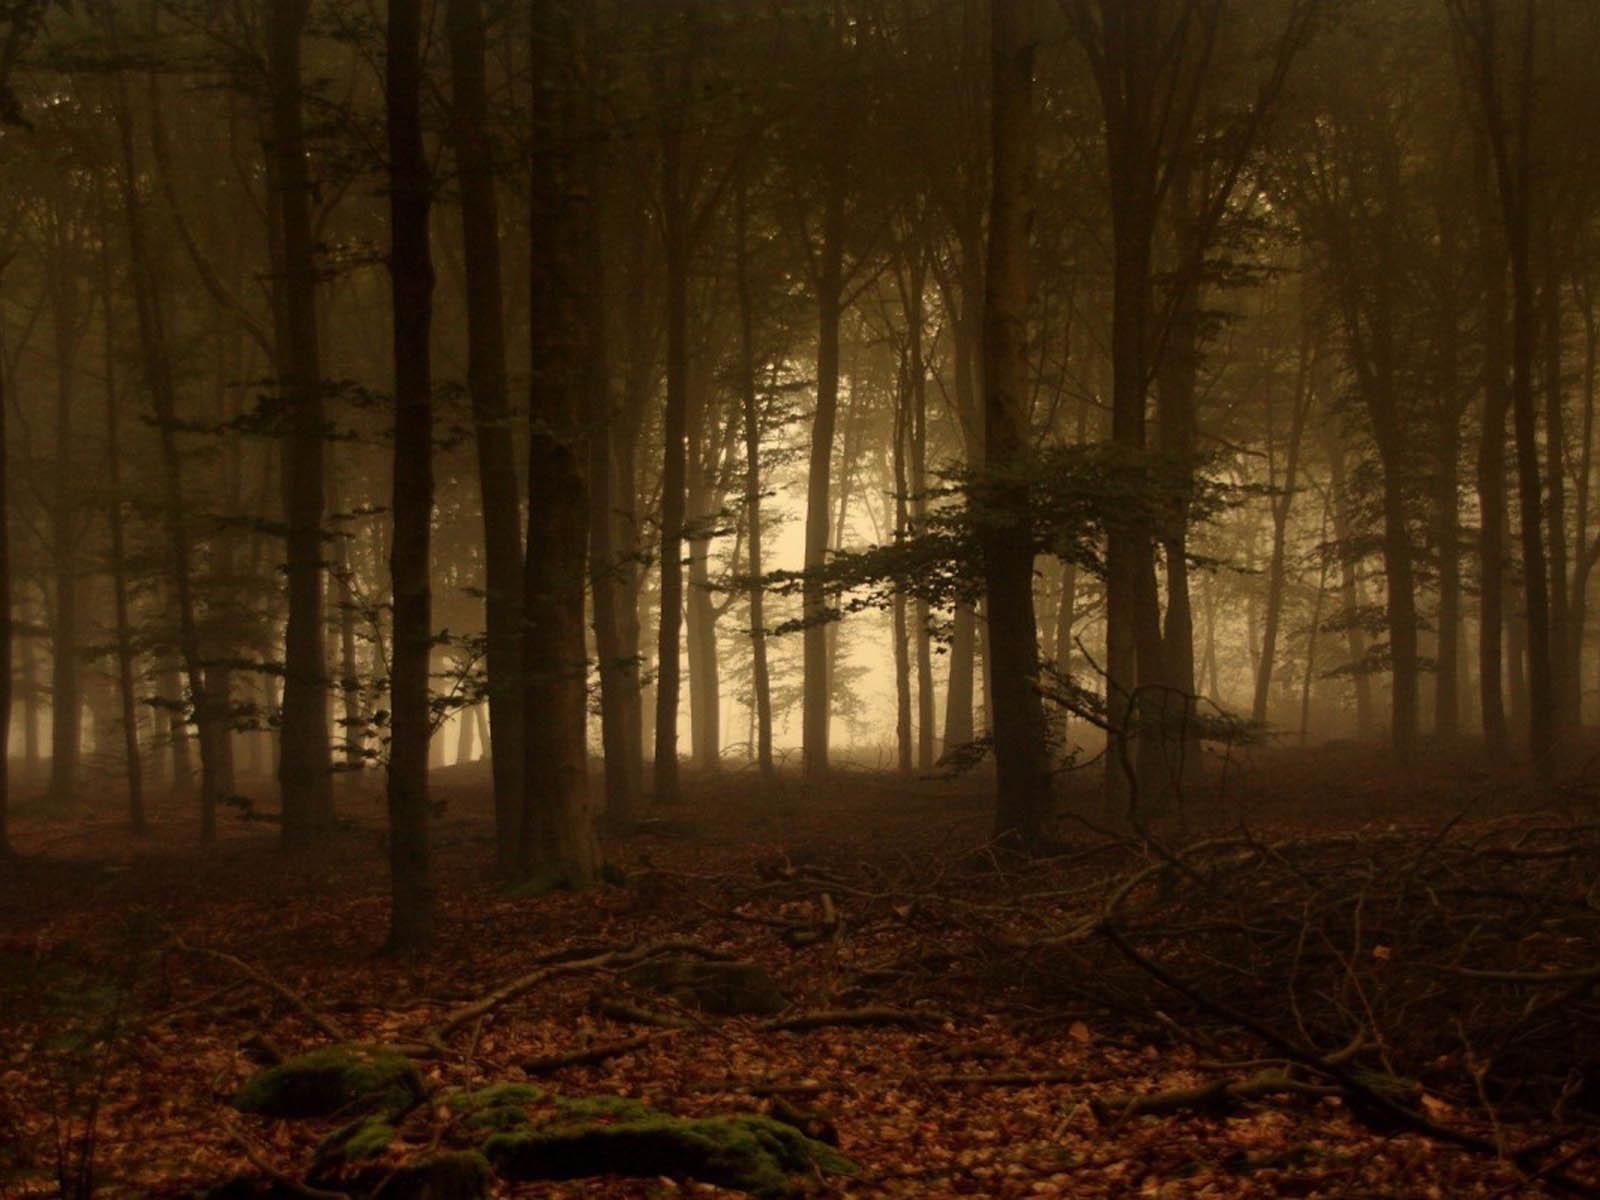 Forest Desktop Wallpapers  Twilight Forest Desktop Backgrounds    Gothic Forest Backgrounds